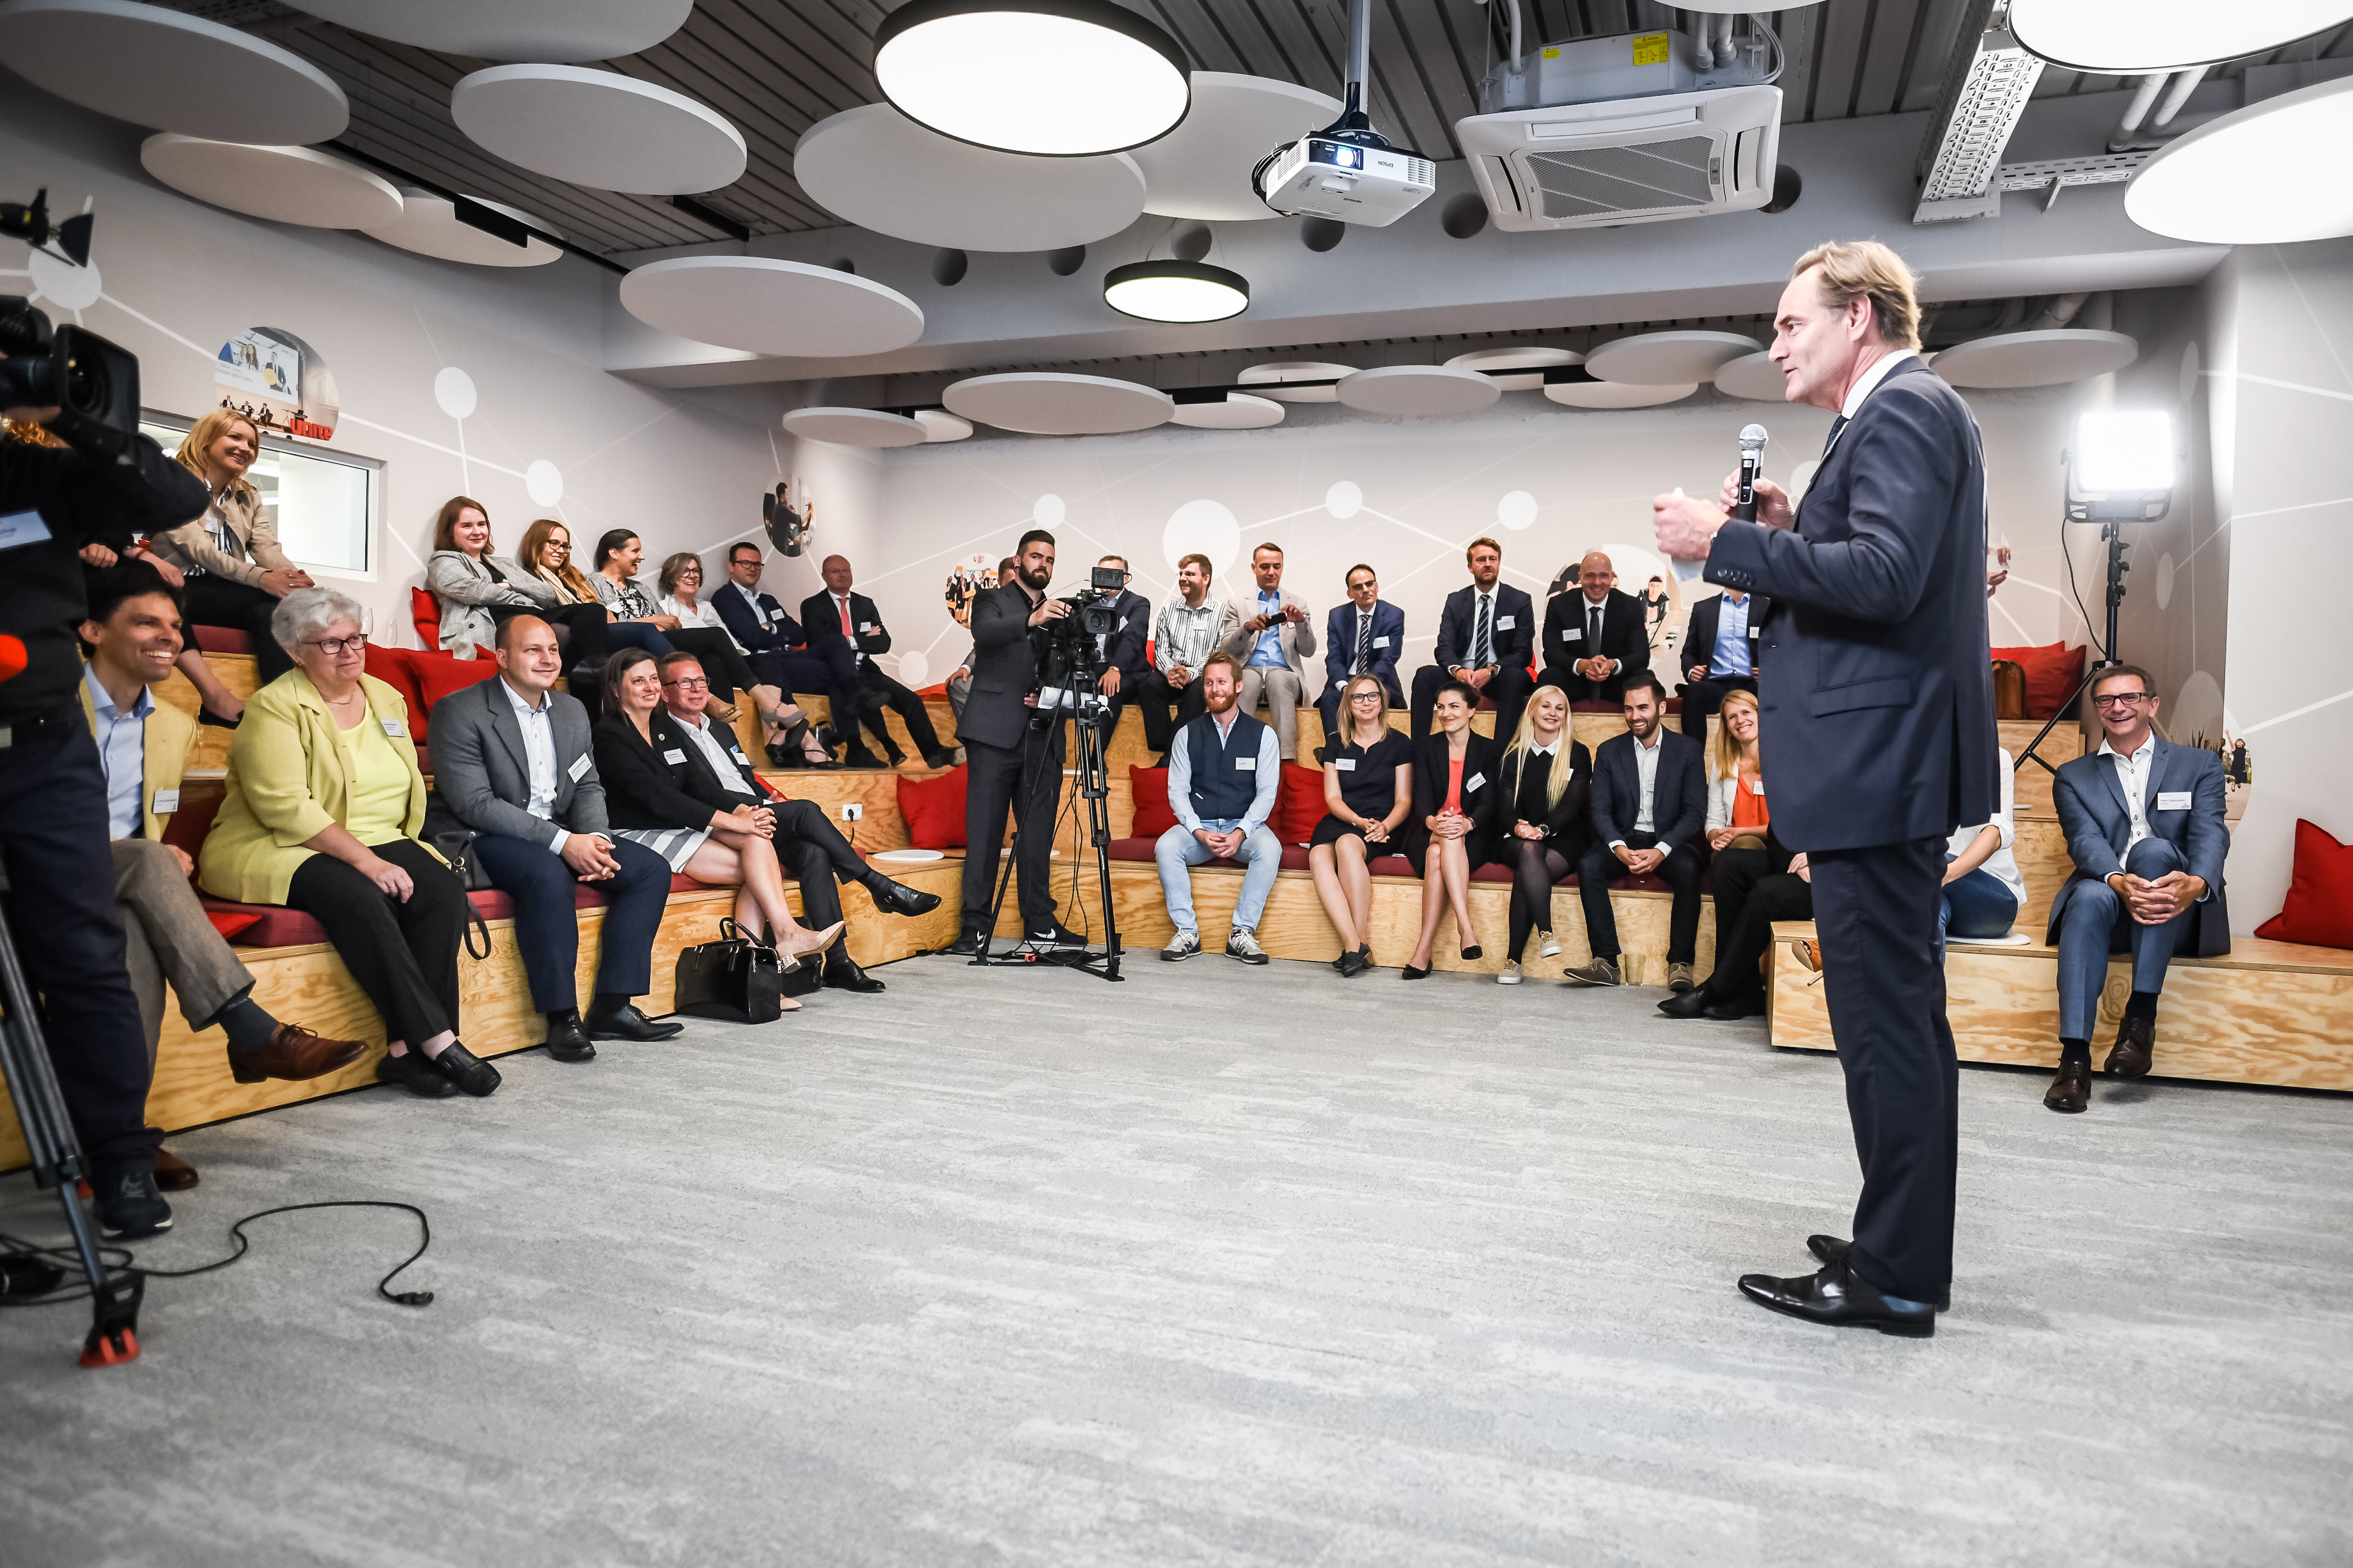 Einweihung Neuer Mercateo Buros In Leipzig